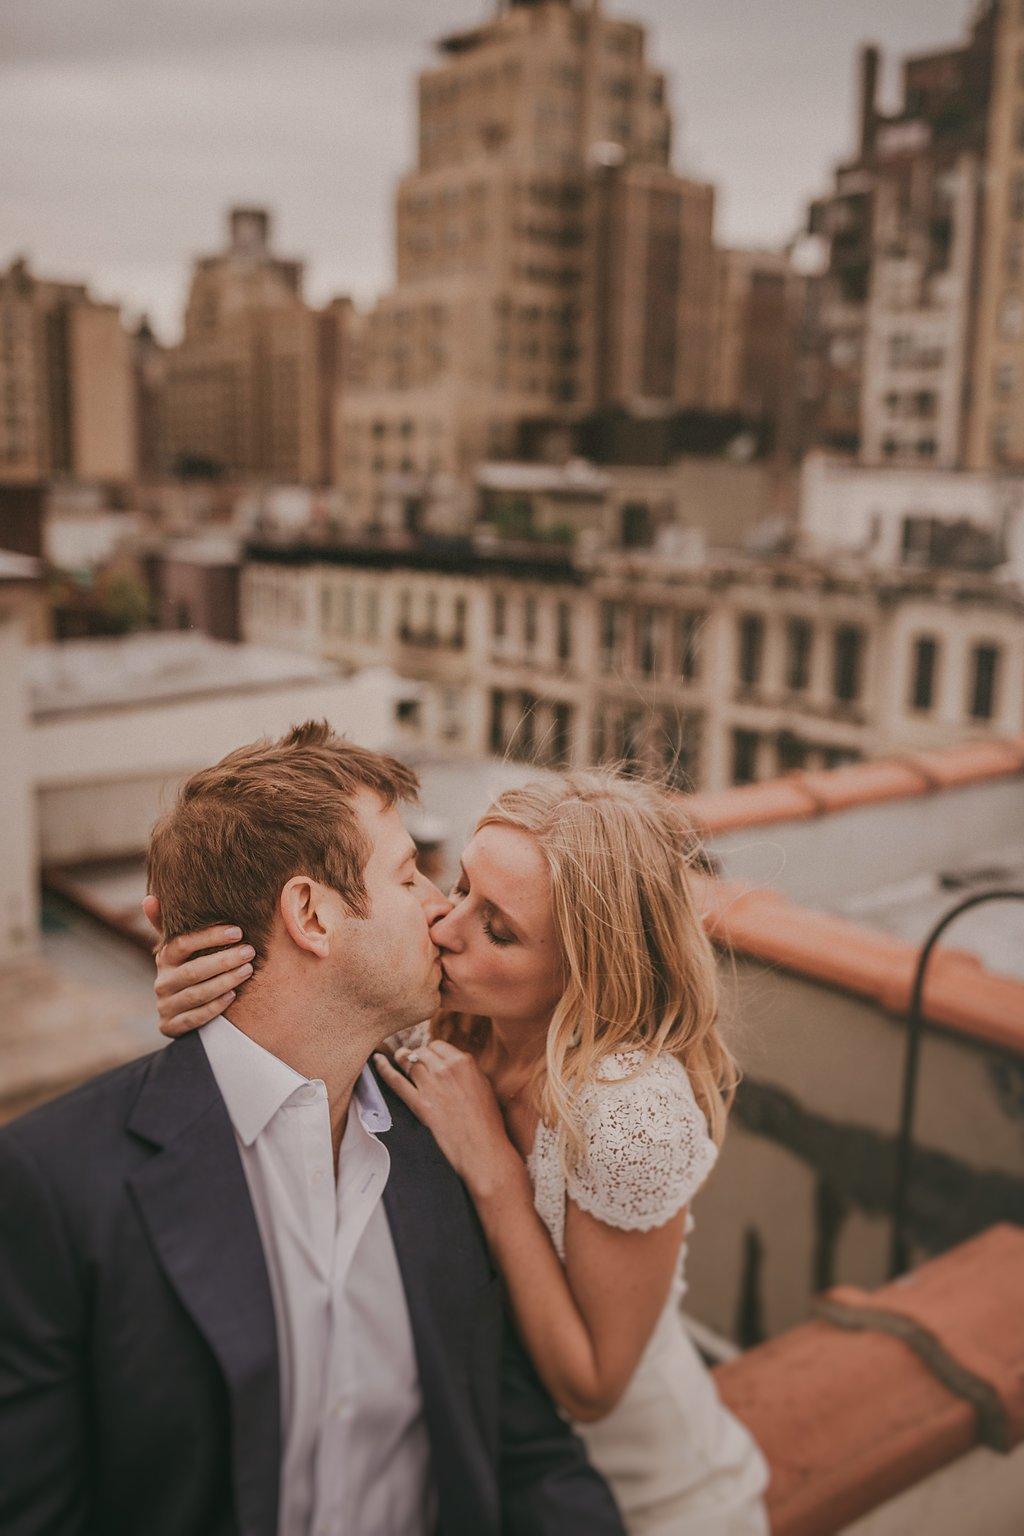 Manhattan New York Elopement Wedding The Creative's Loft Wedding Planning Studio NYC Pablo Laguia International Photographer